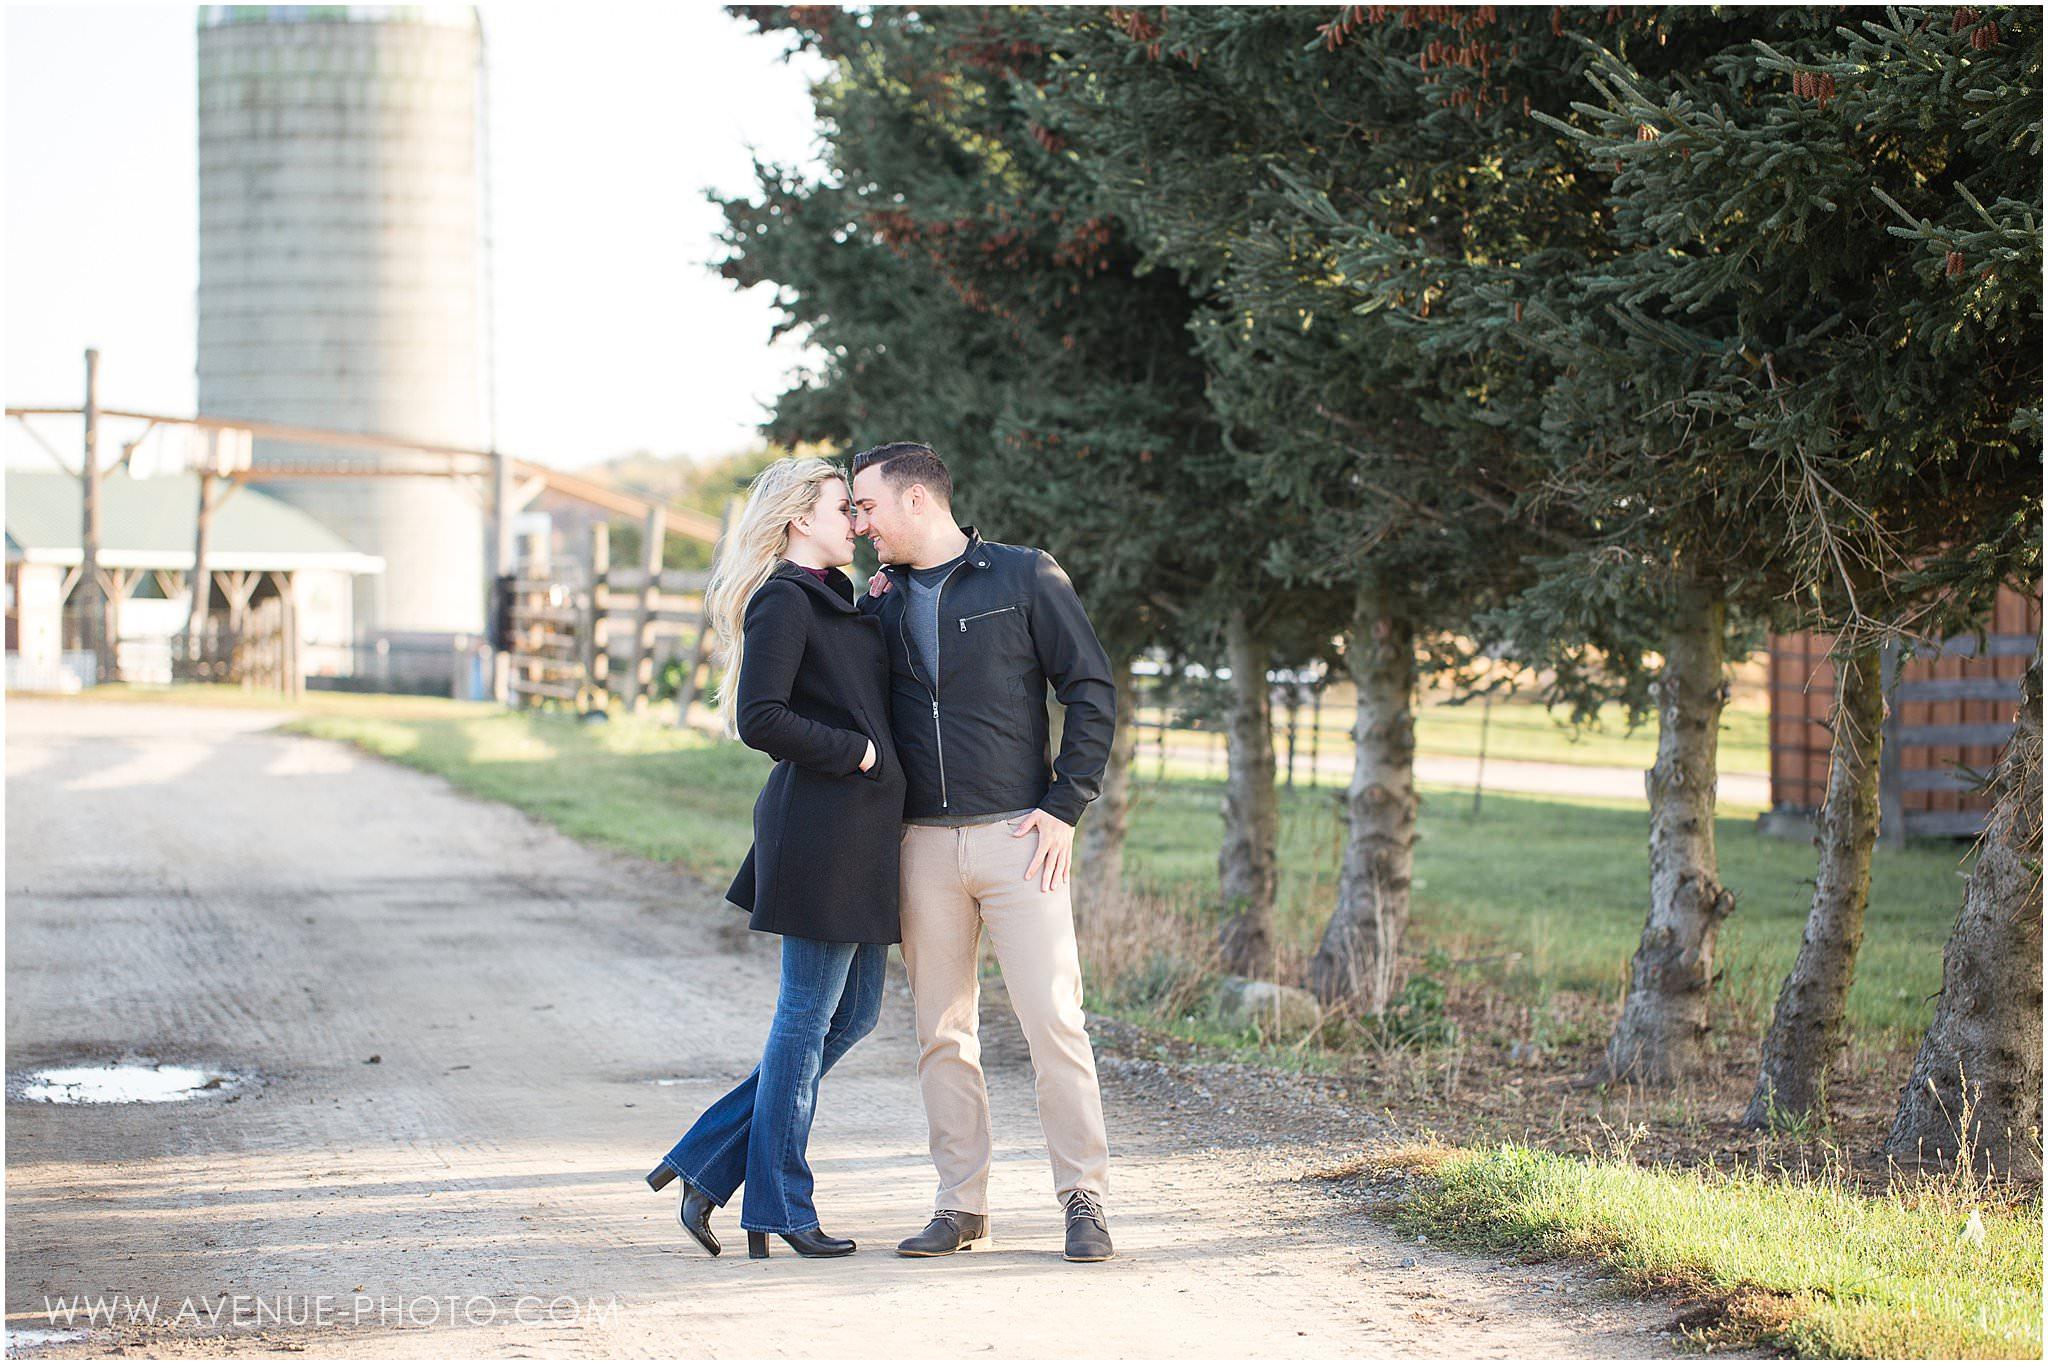 Fall Farm Engagement photo session, Autumn, Caledon, Caledon Farm, corn maze, Downey's Farm Market, Engagement Photography, Fall, Ontario, pumpkins